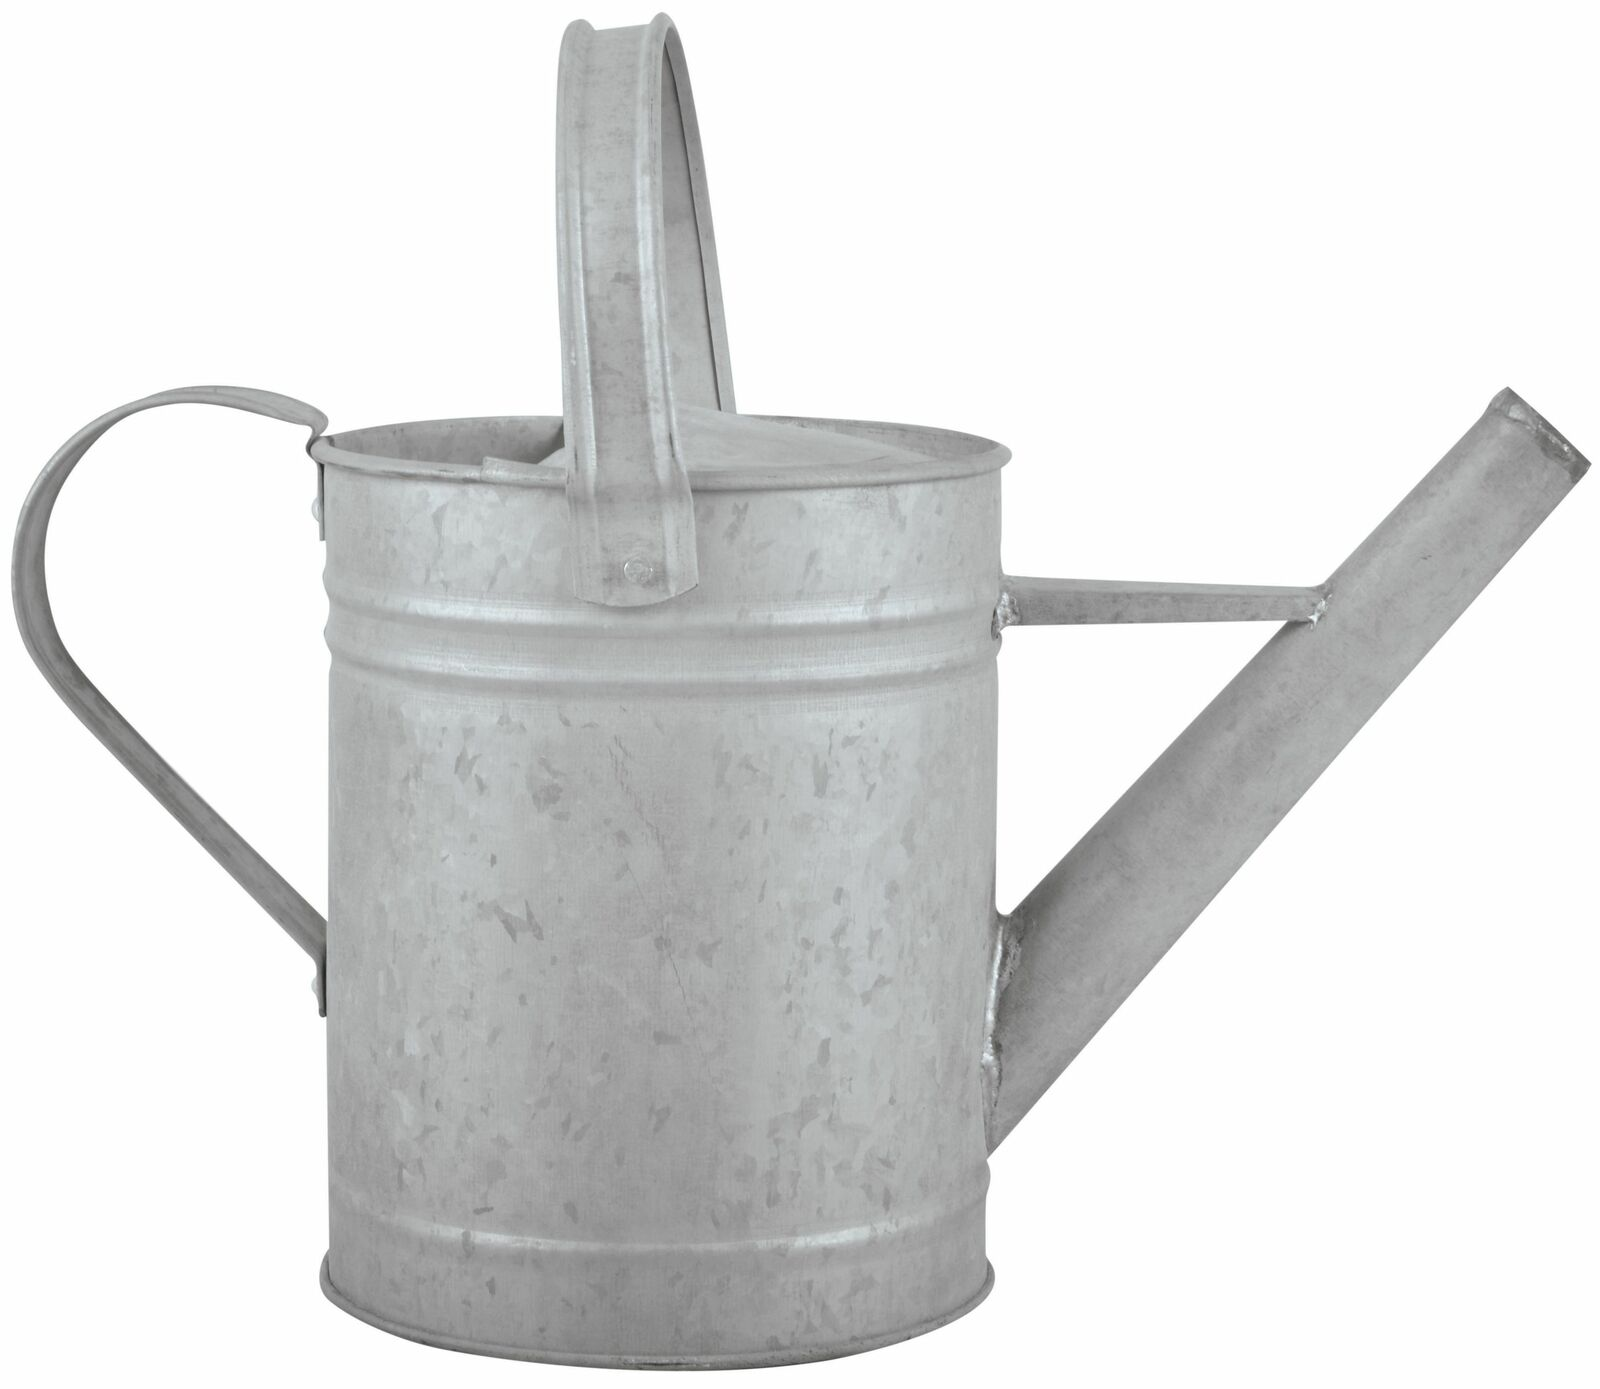 Esschert Design Watering Can Zinc Galvanised 1,6 Litre Country House Style Jug